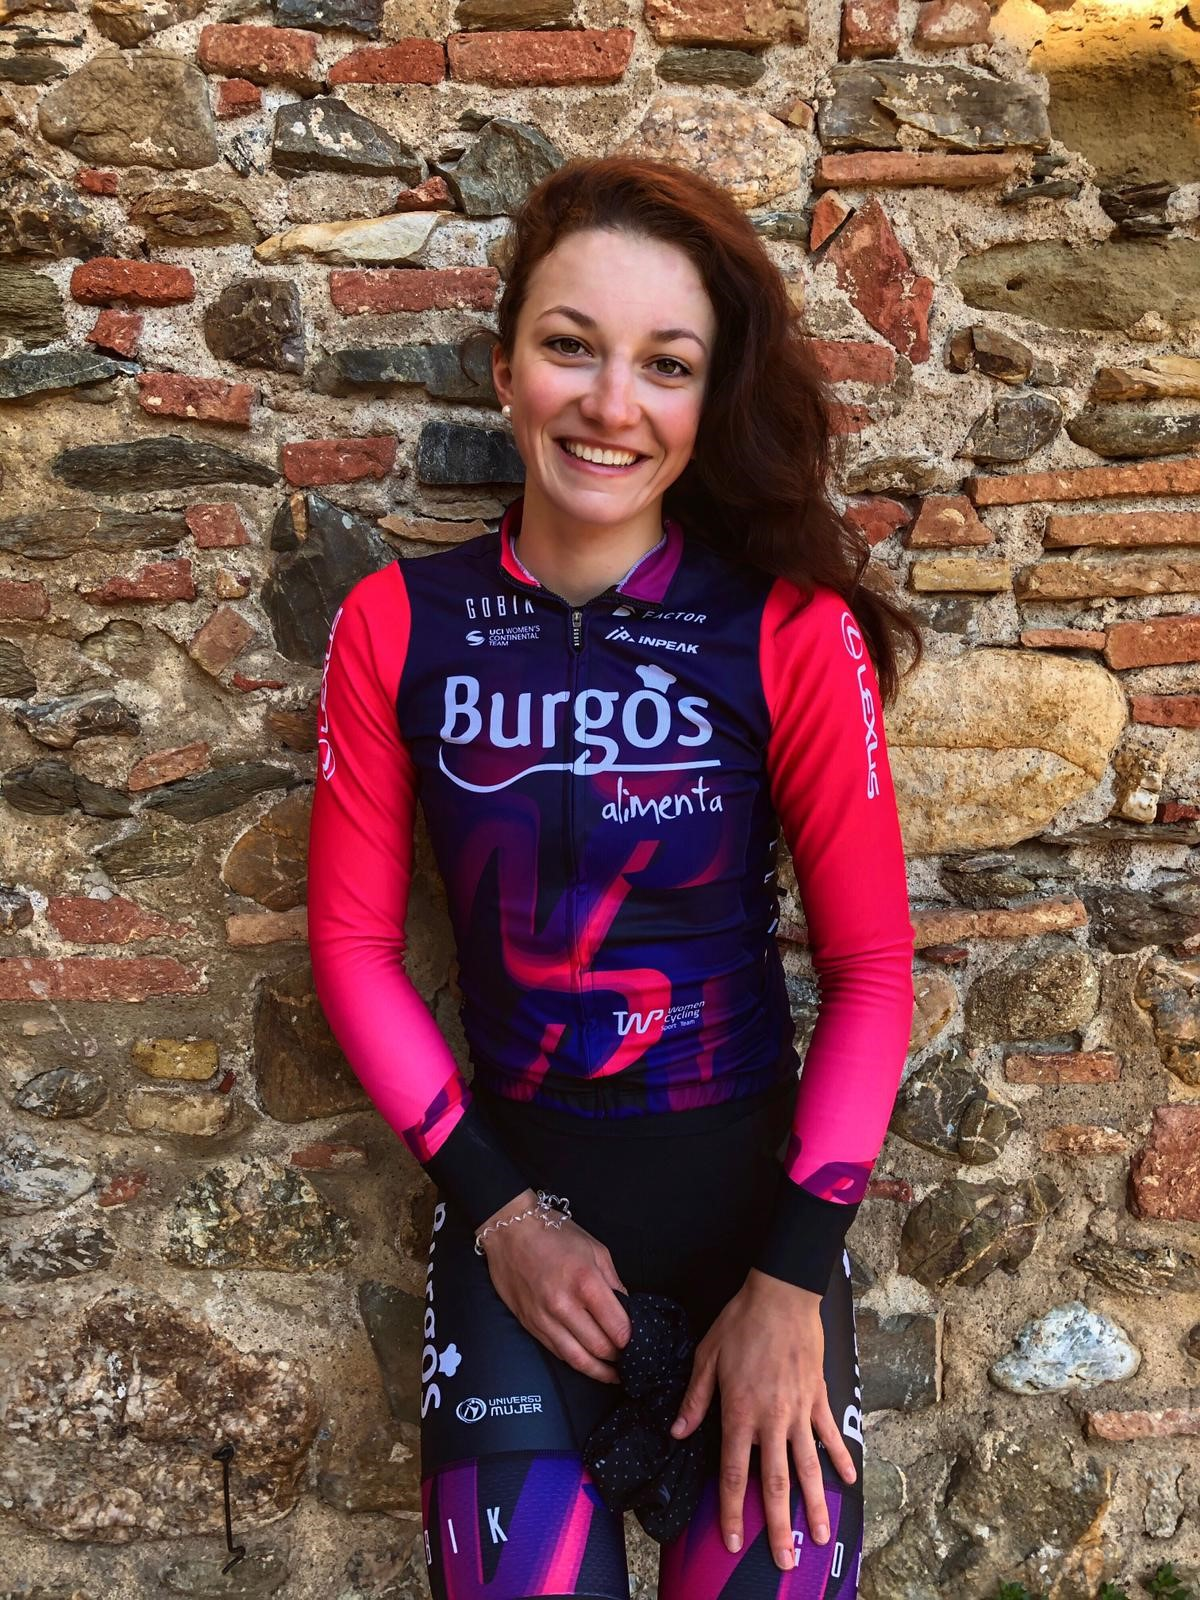 Tereza Neumanová, česká reprezentantka ve službách Burgos Alimenta.